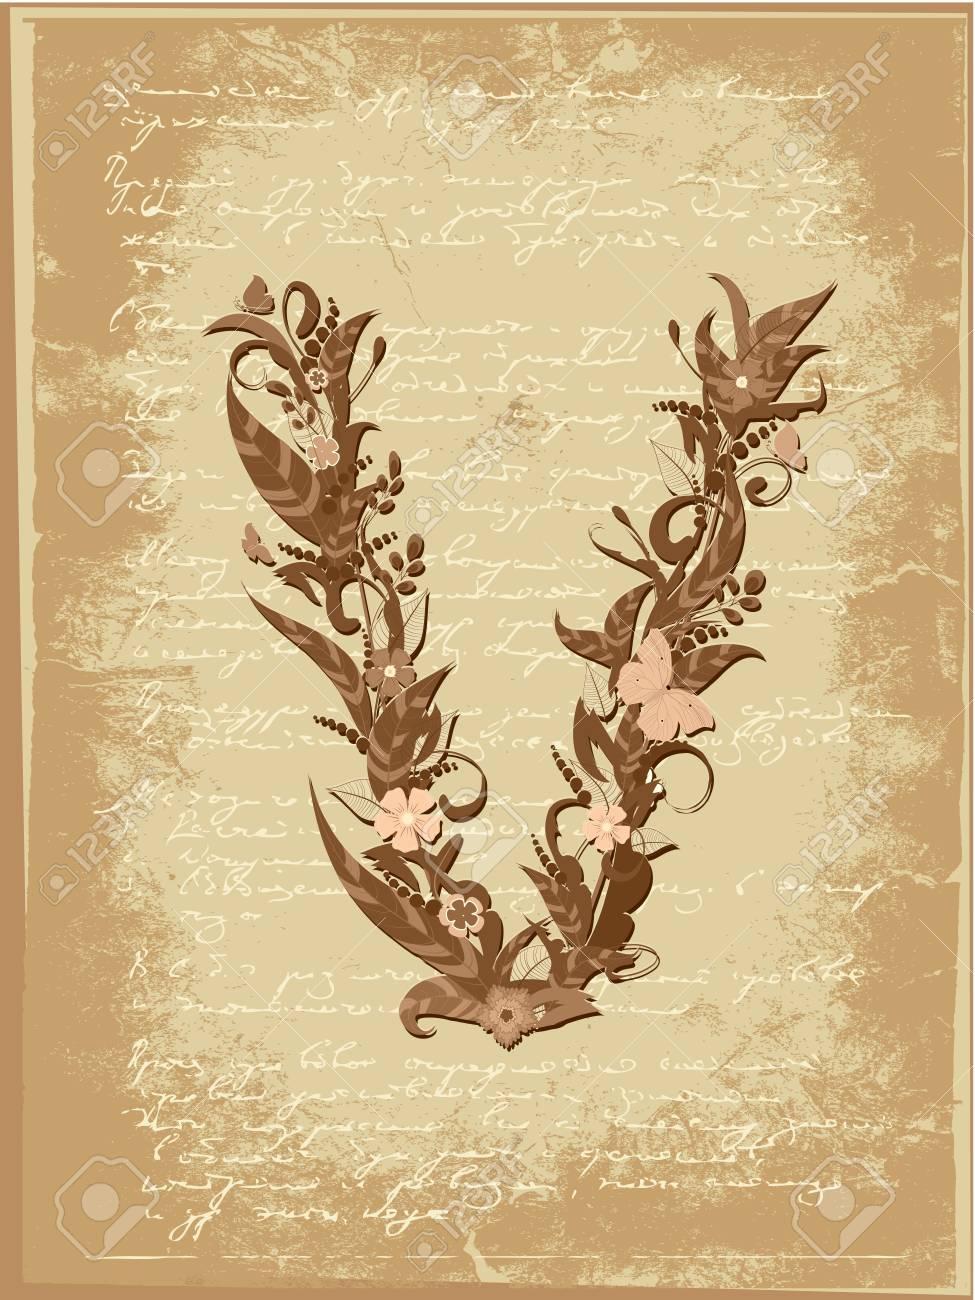 Floral letter on paper grunge Stock Vector - 9851501